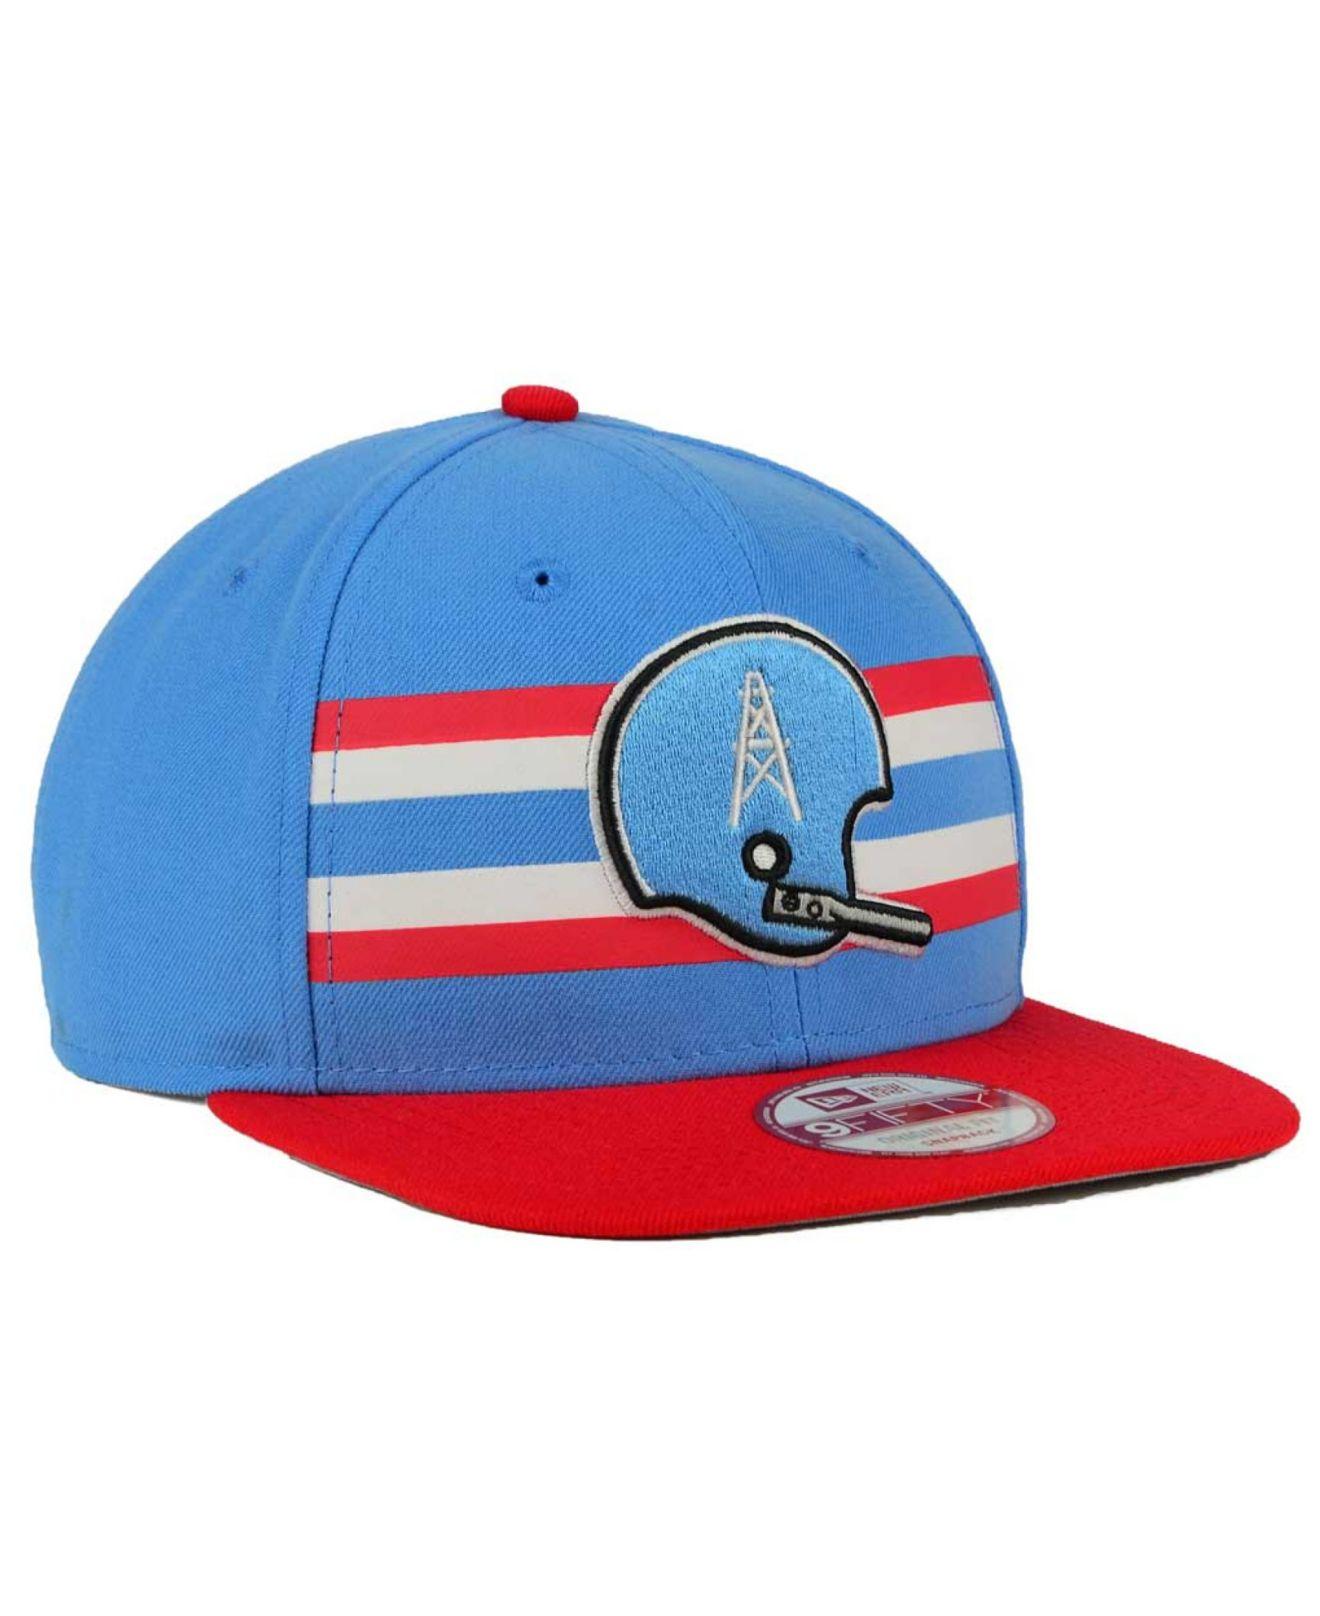 bb946daa677 Lyst - KTZ Houston Oilers Retro Striped 9fifty Snapback Cap in Blue ...